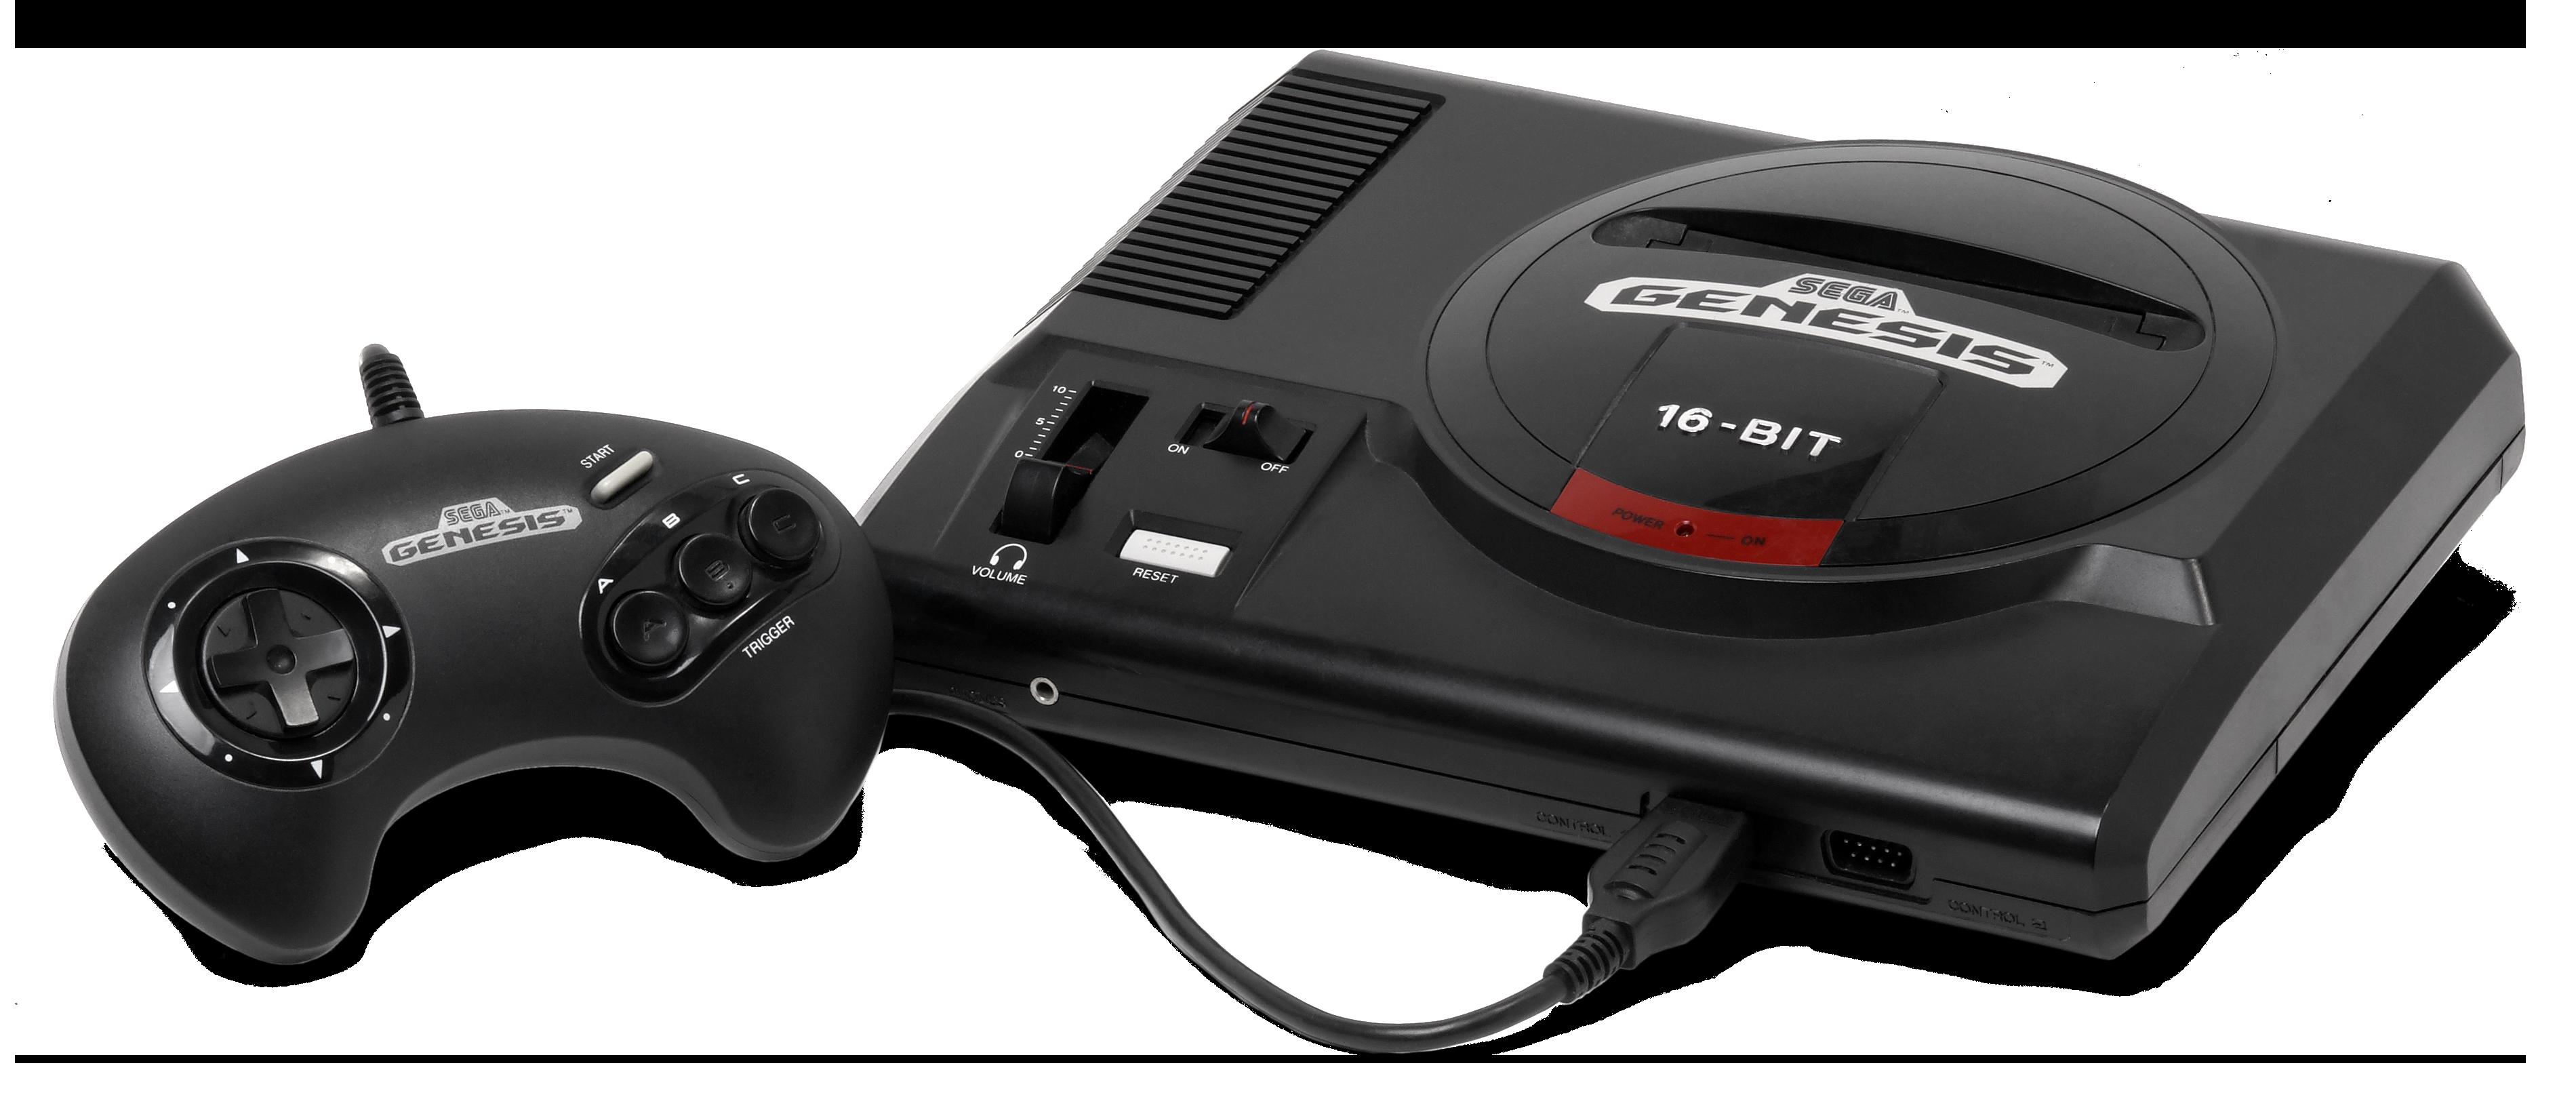 File:Sega-Genesis-Mod1-Set.png - Wikimedia Commons